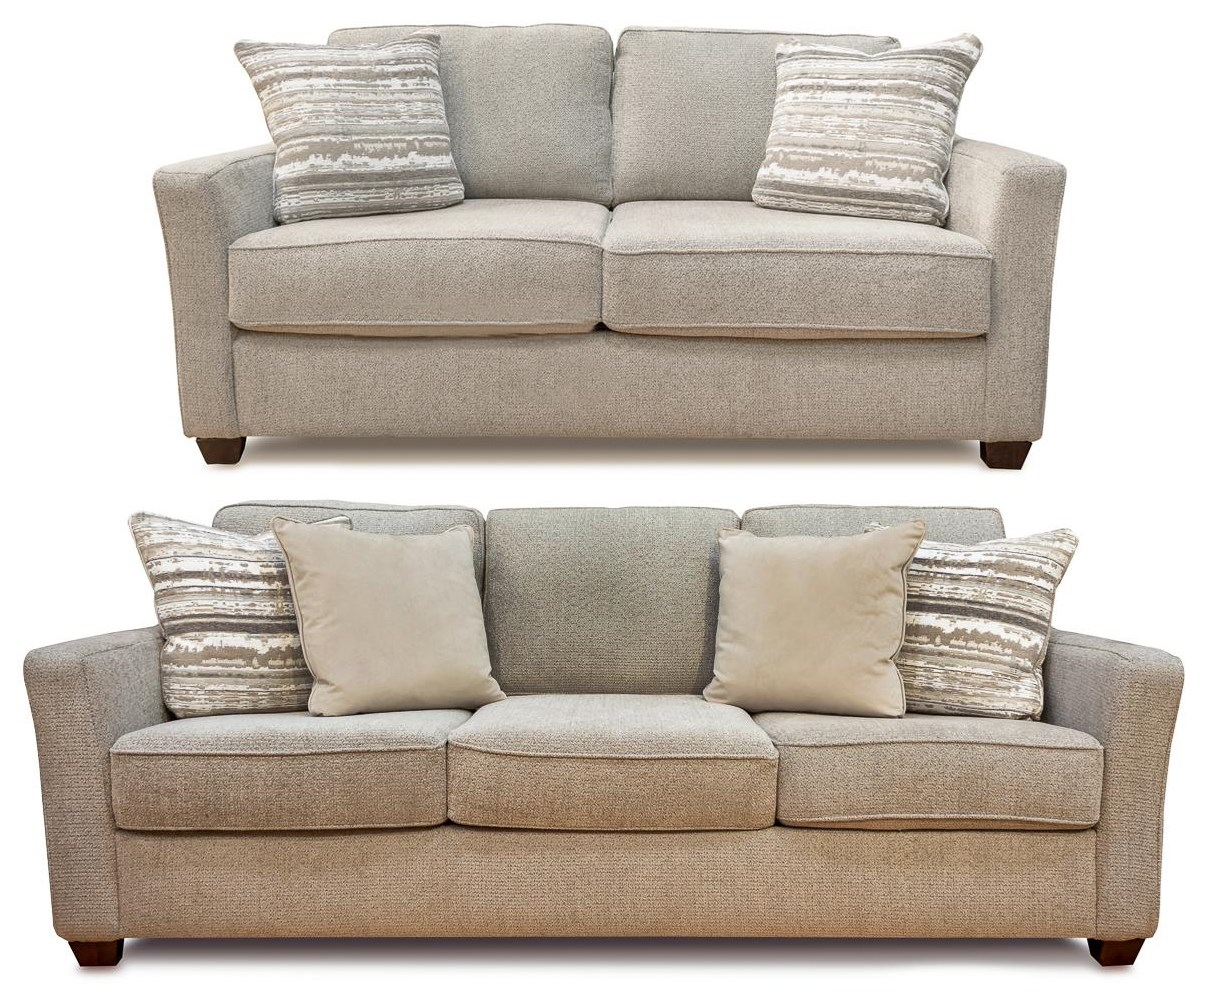 Tiffany 2PC Sofa & Loveseat Set at Rotmans